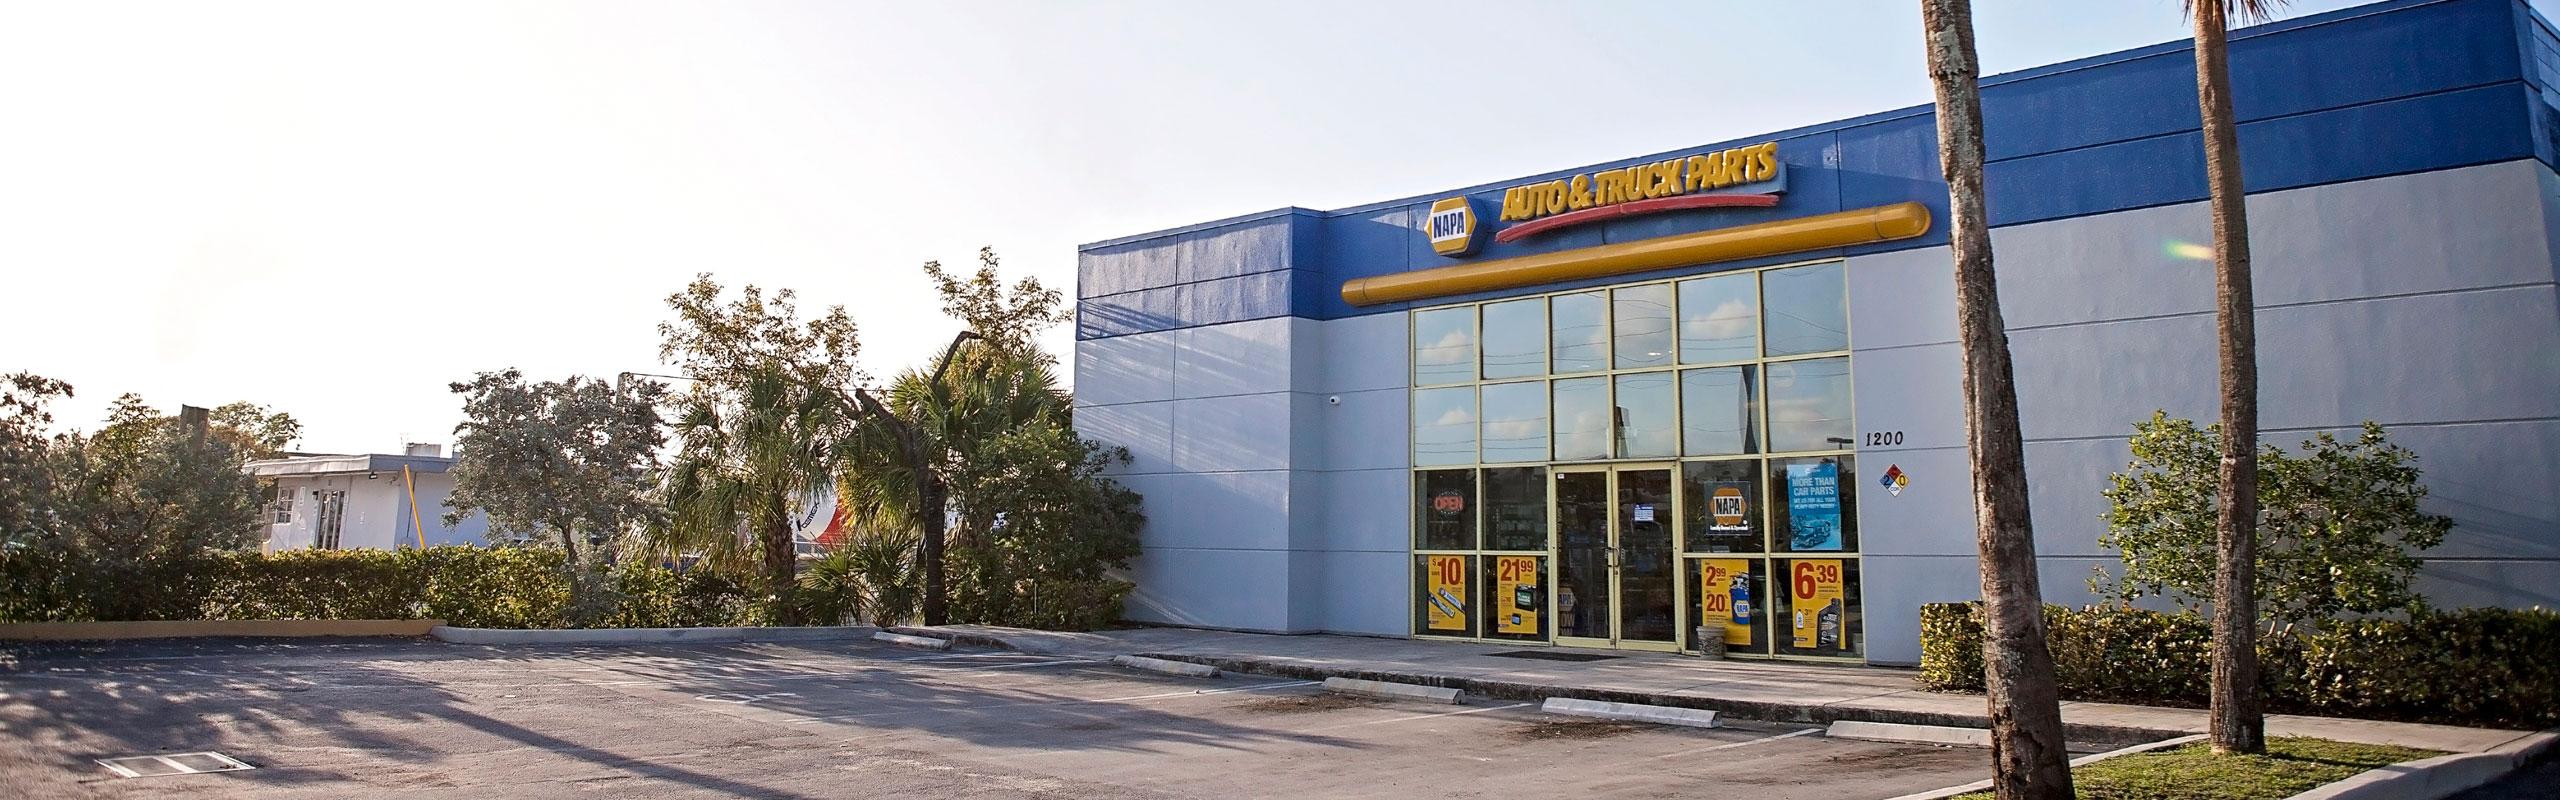 M H Automotive Broward County Florida S Premier Napa Auto And Truck Parts Stores